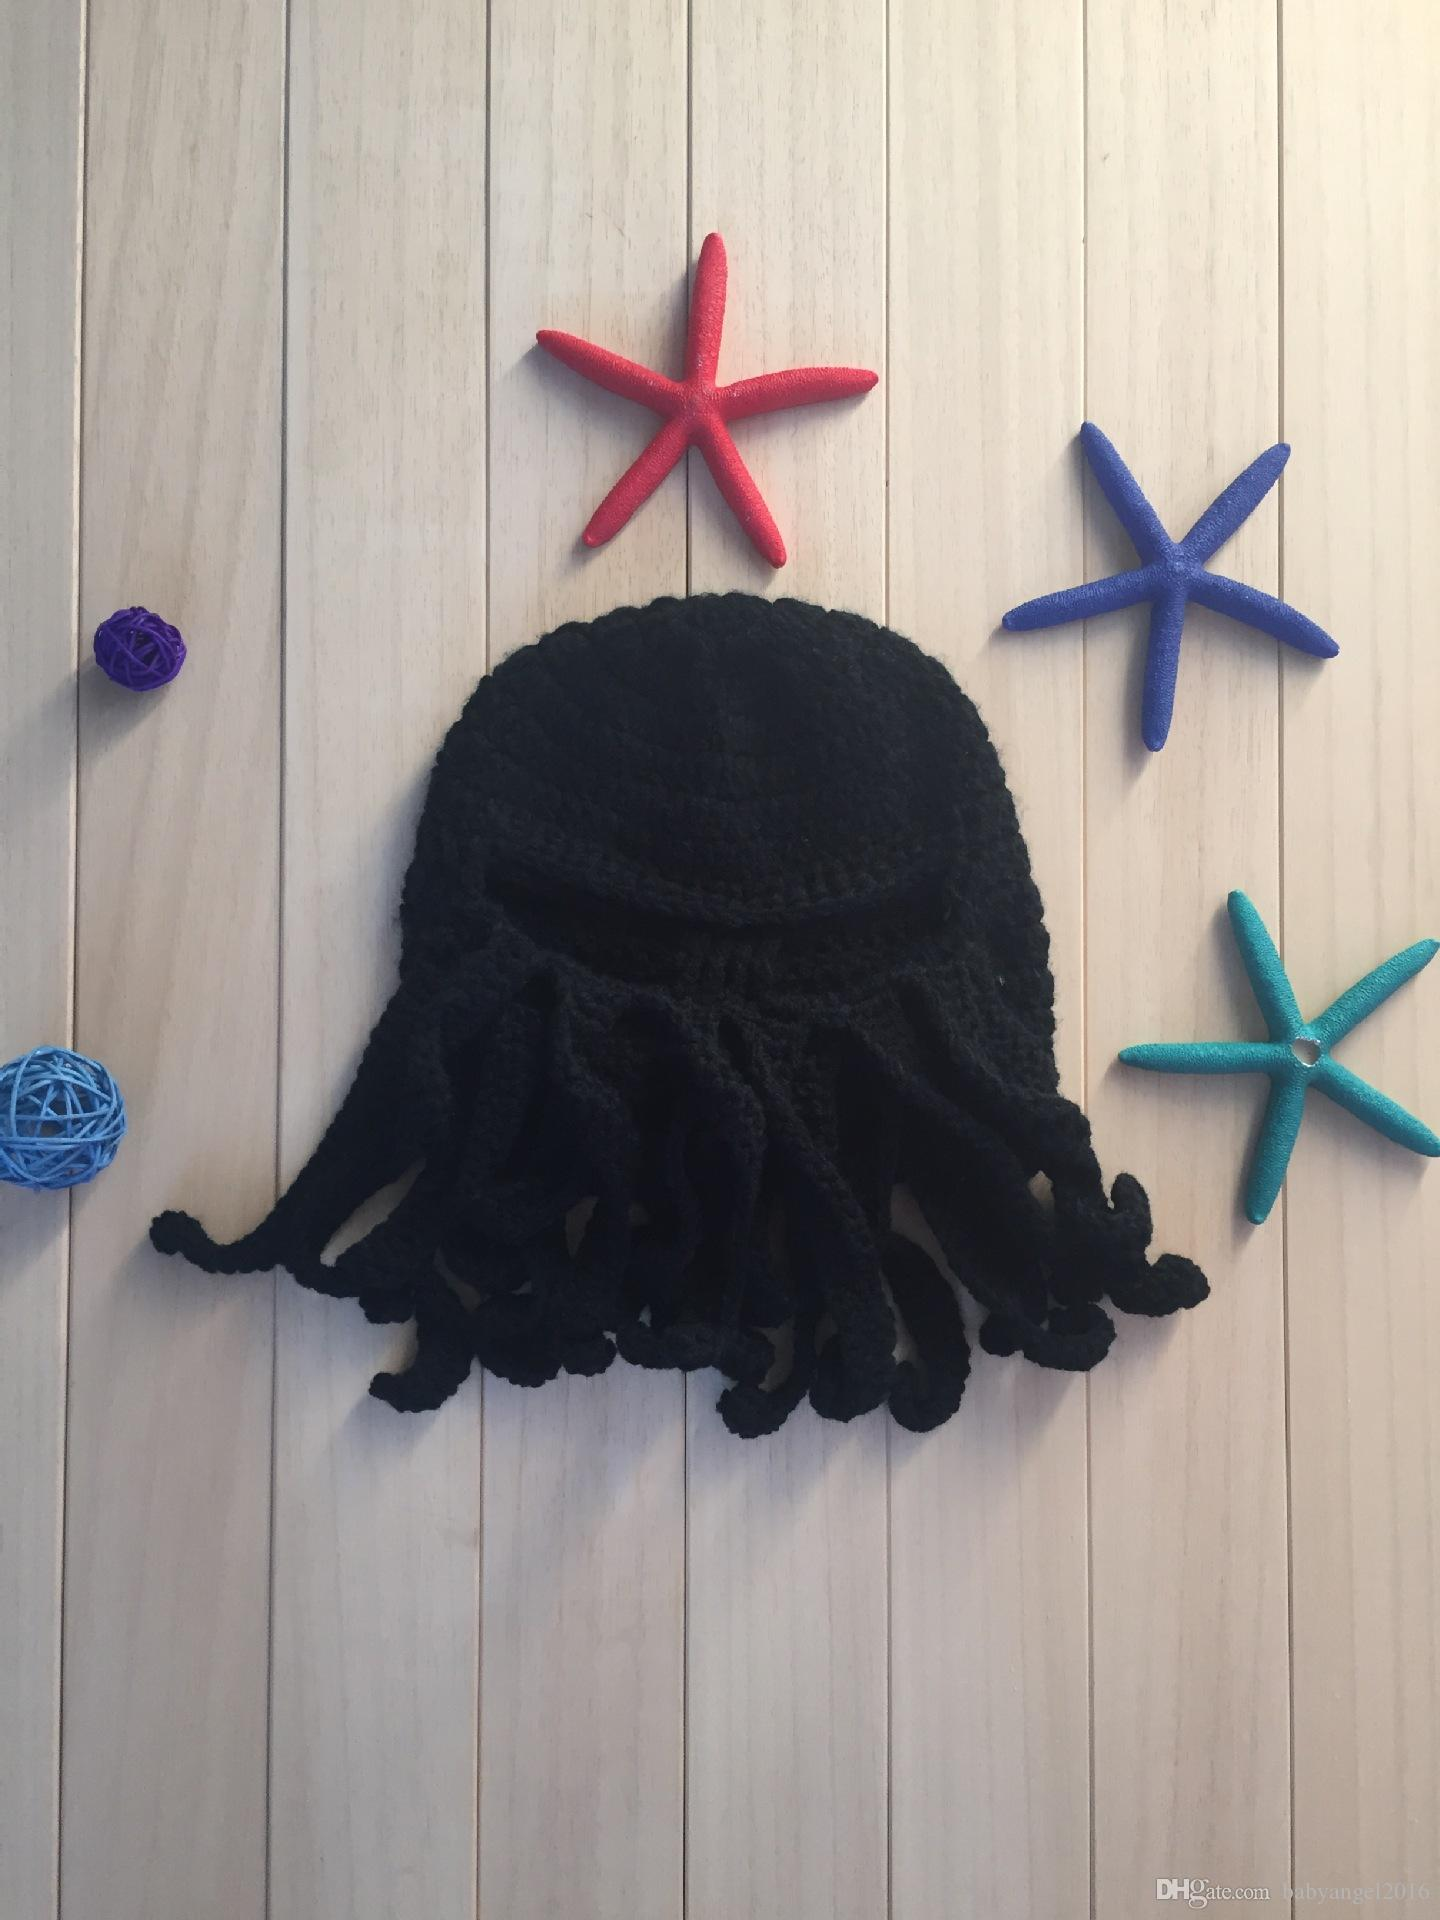 Unisex Octopus Beanie Squid Cap Tentacle lavorato a maglia di lana Ski Face Mask Knit Hat Sea Monster Crochet Beanie Cthulhu Octopus Caps Halloween